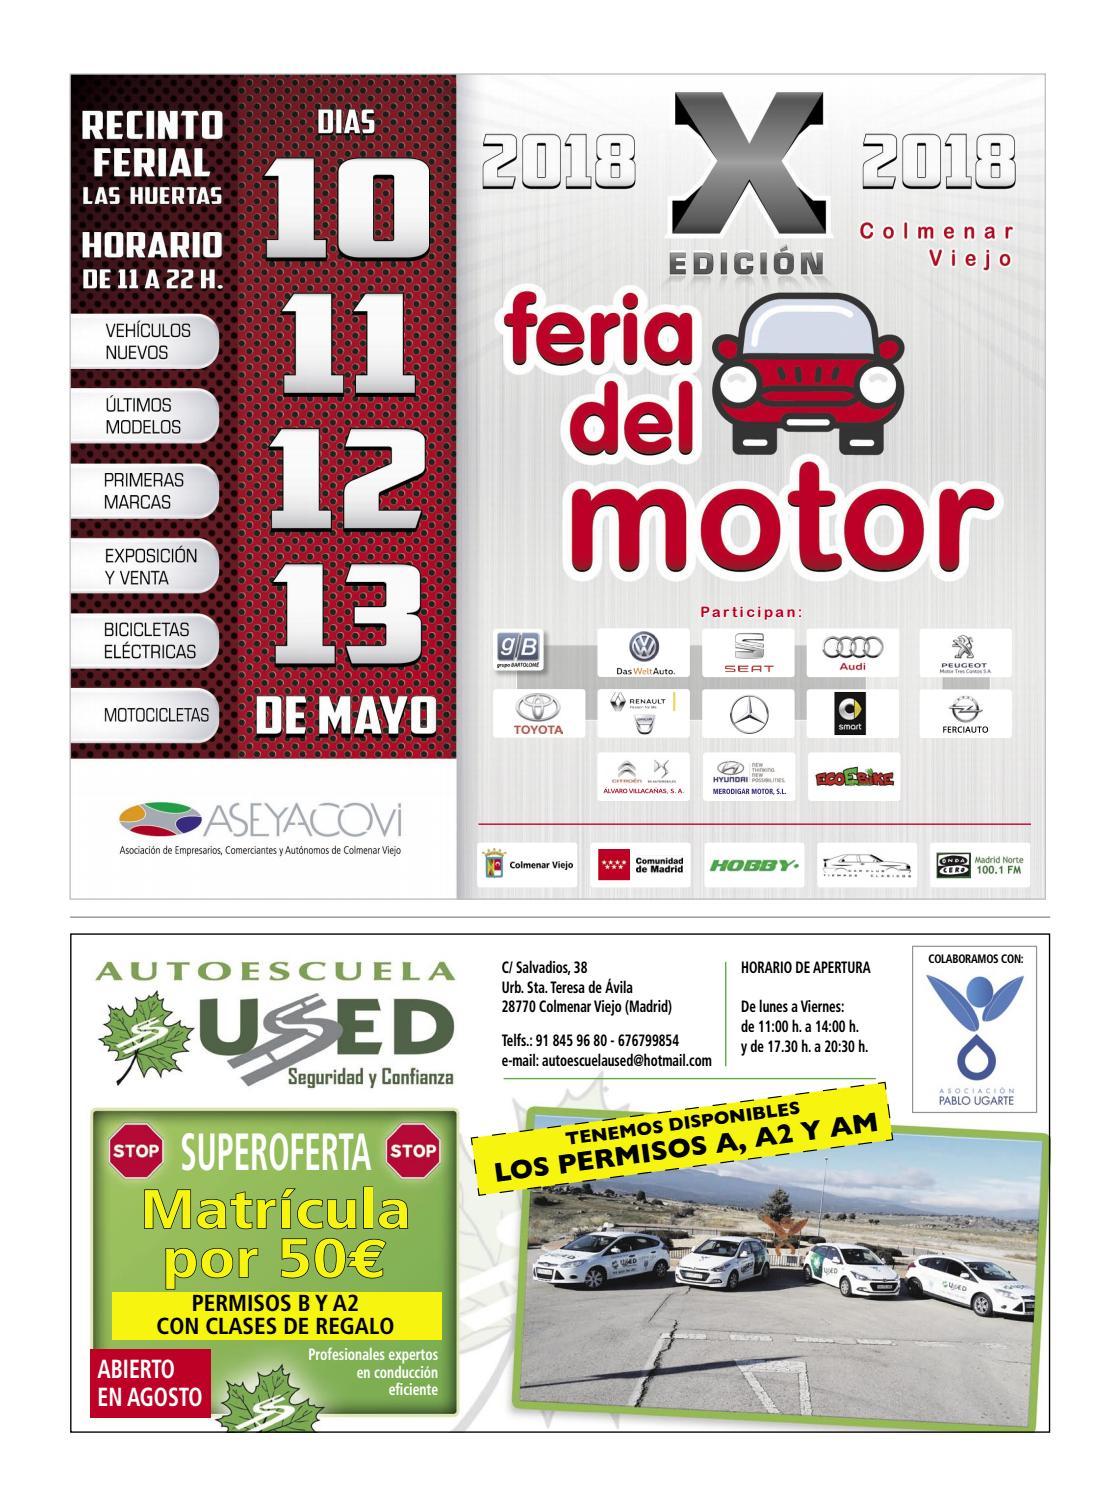 Circuito Quemagrasas : El Único nº152. abril 2018 by aseyacovi issuu